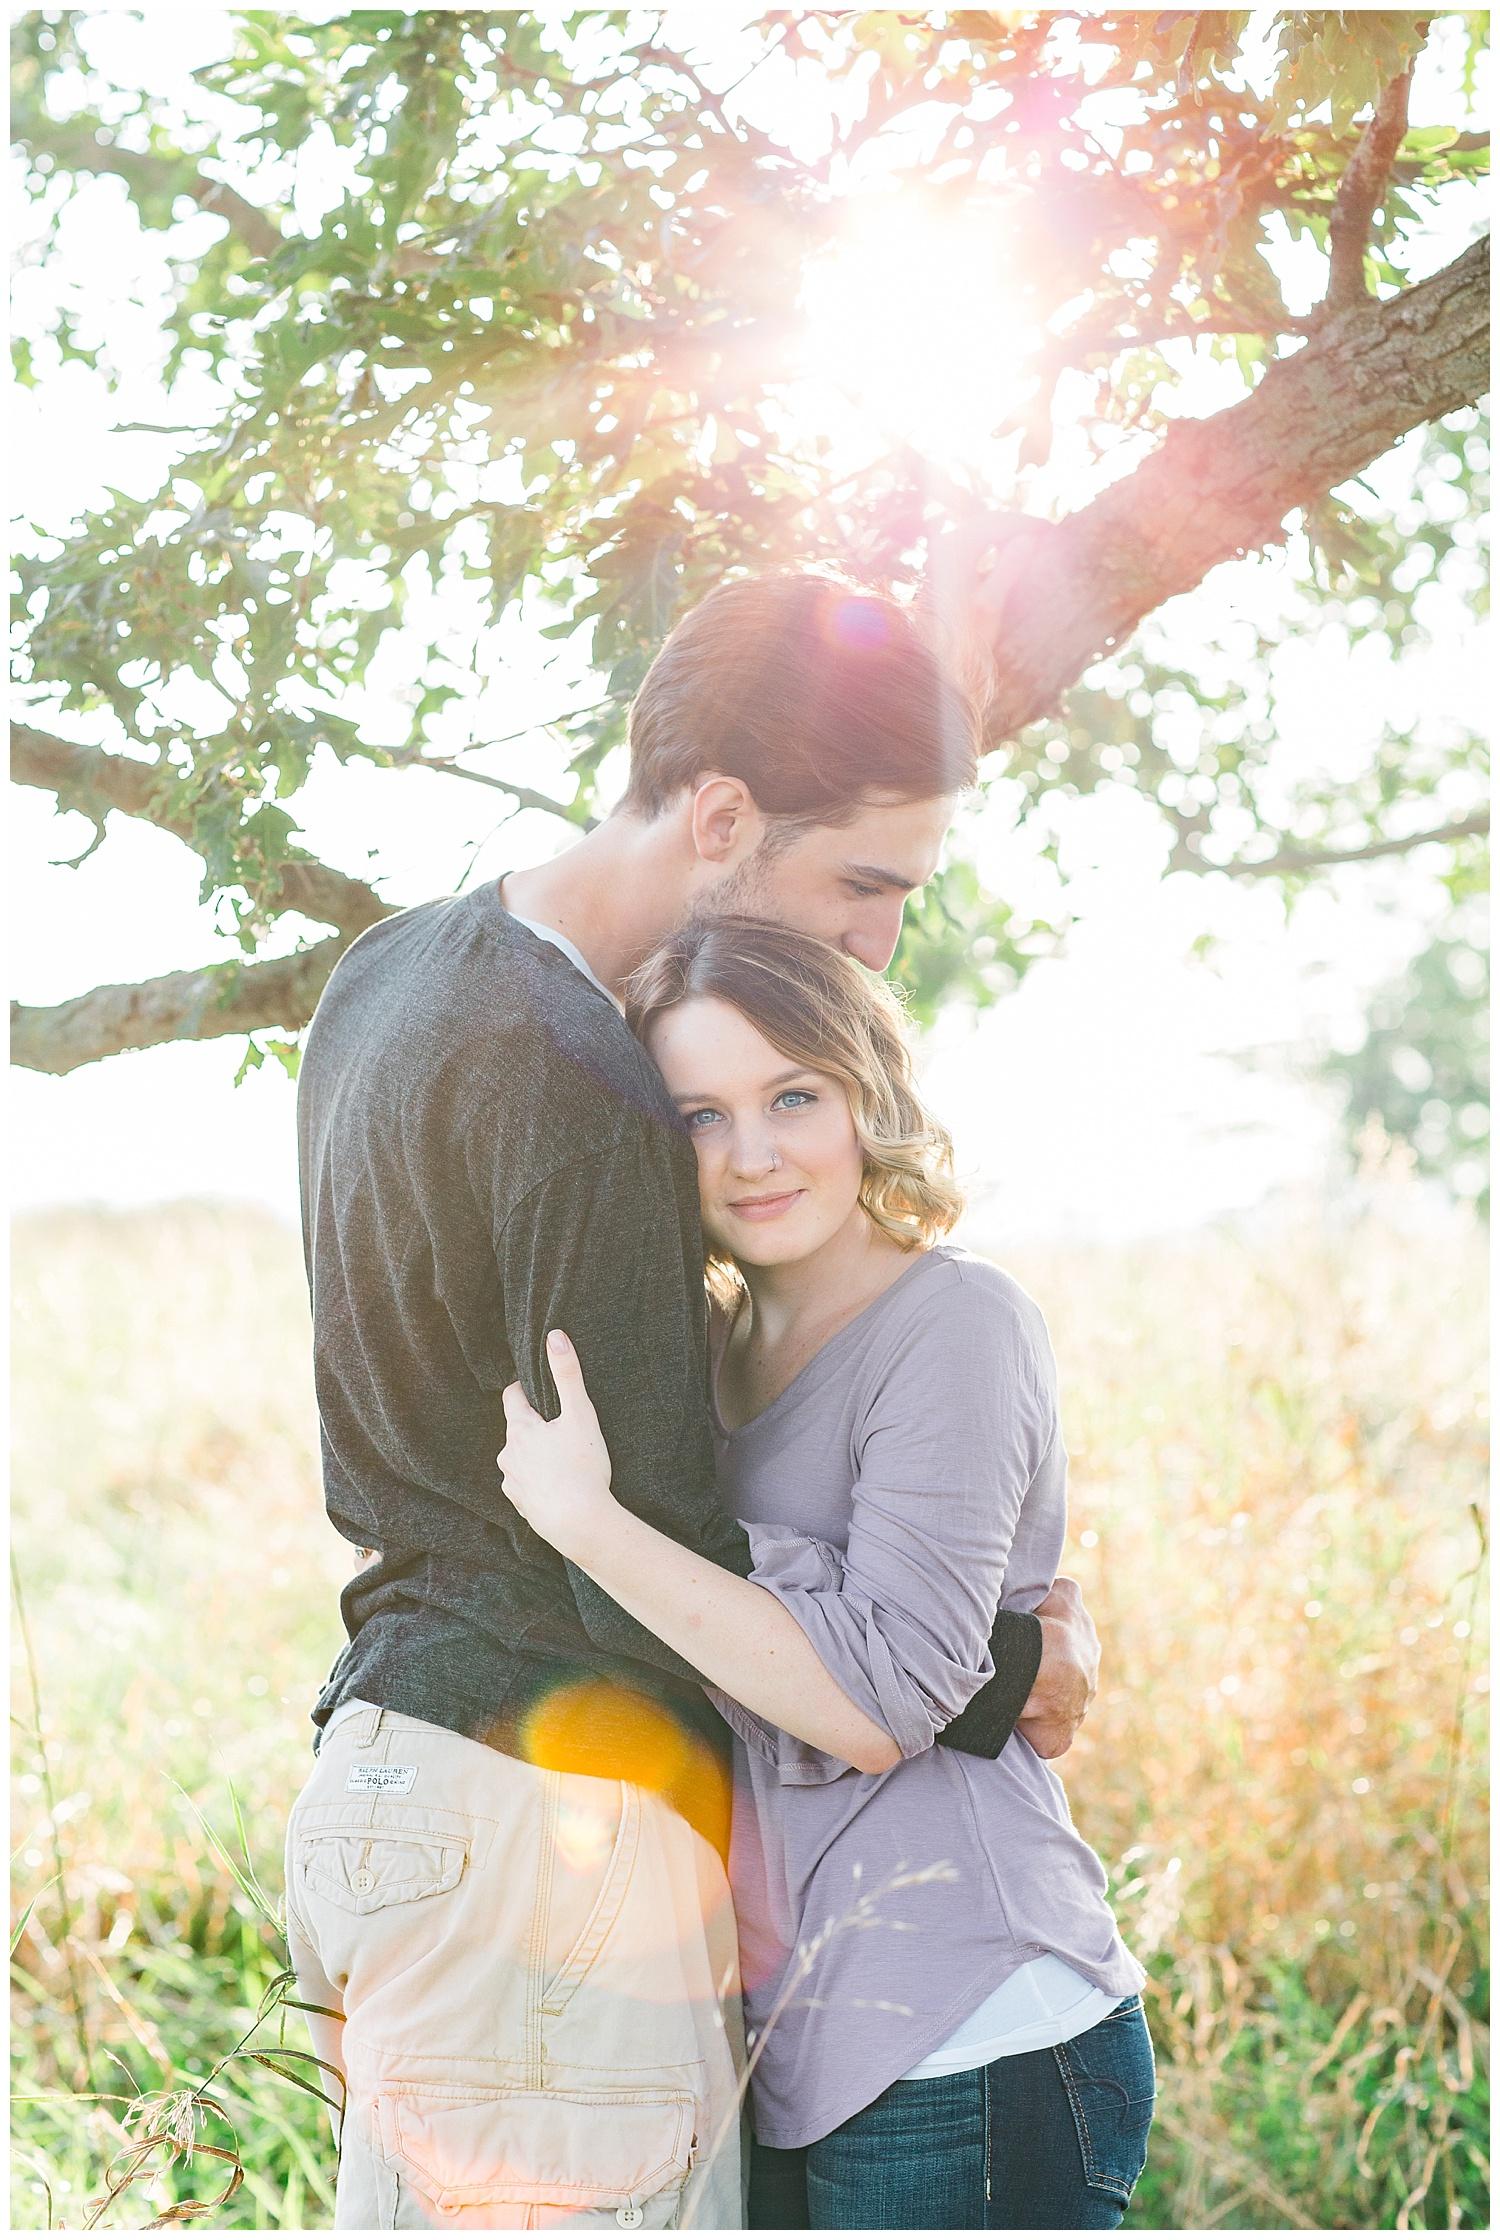 Tanya and Ryan - Sweetheart session - Lass & Beau - Geneseo NY-238_Buffalo wedding photography.jpg